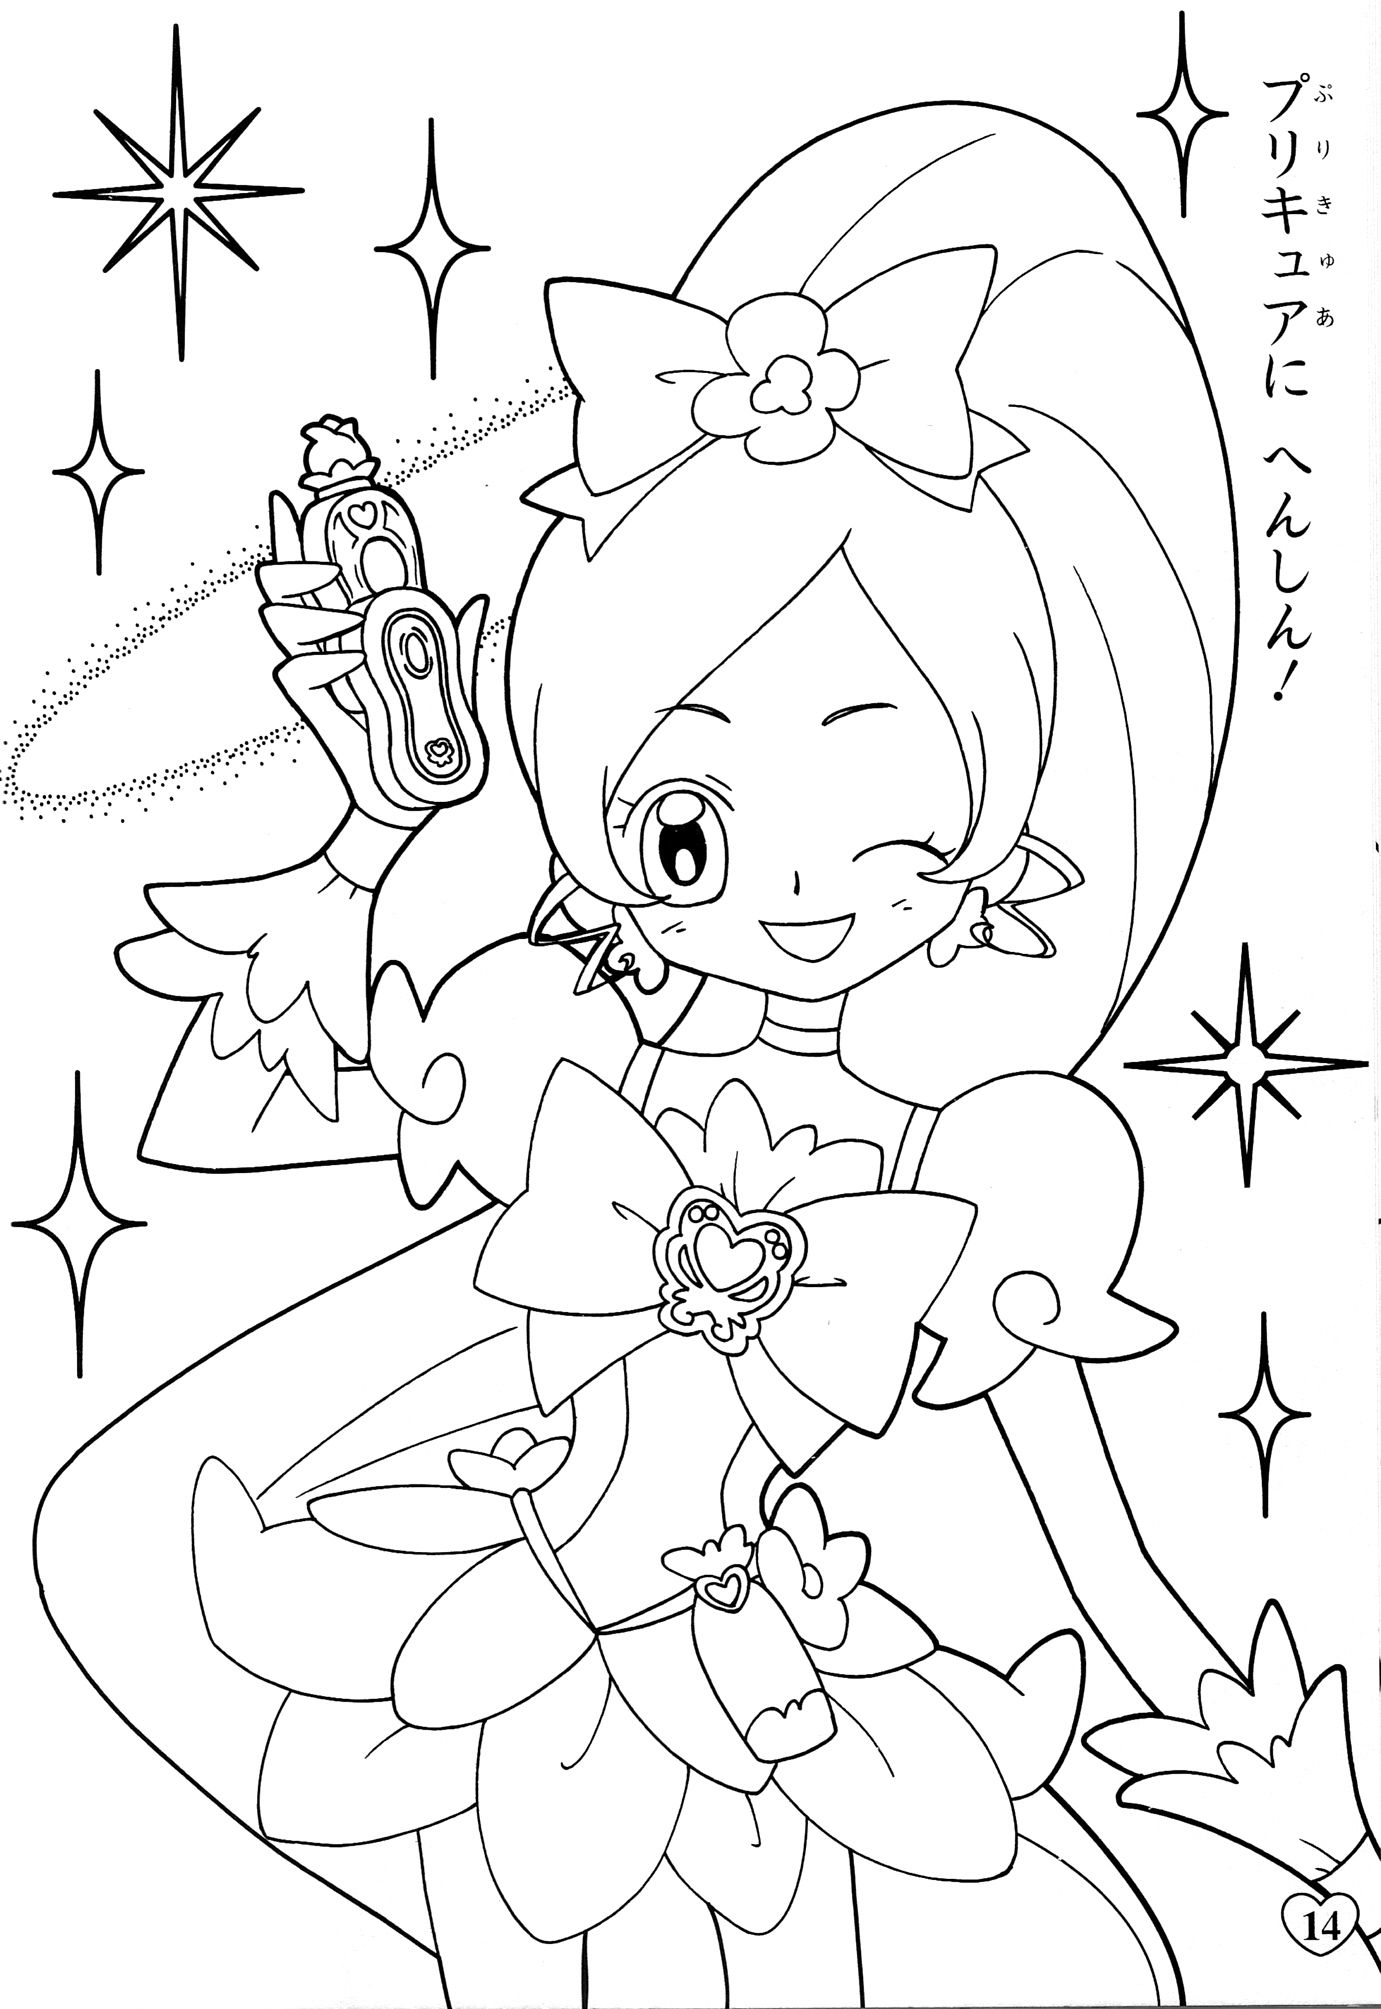 Http Www Oasidelleanime Com Minisiti Colorare Fresh Pretty Original5 Heartcatch Pretty Cure 16 Jpg Coloring Books Coloring Pages Magical Girl Anime